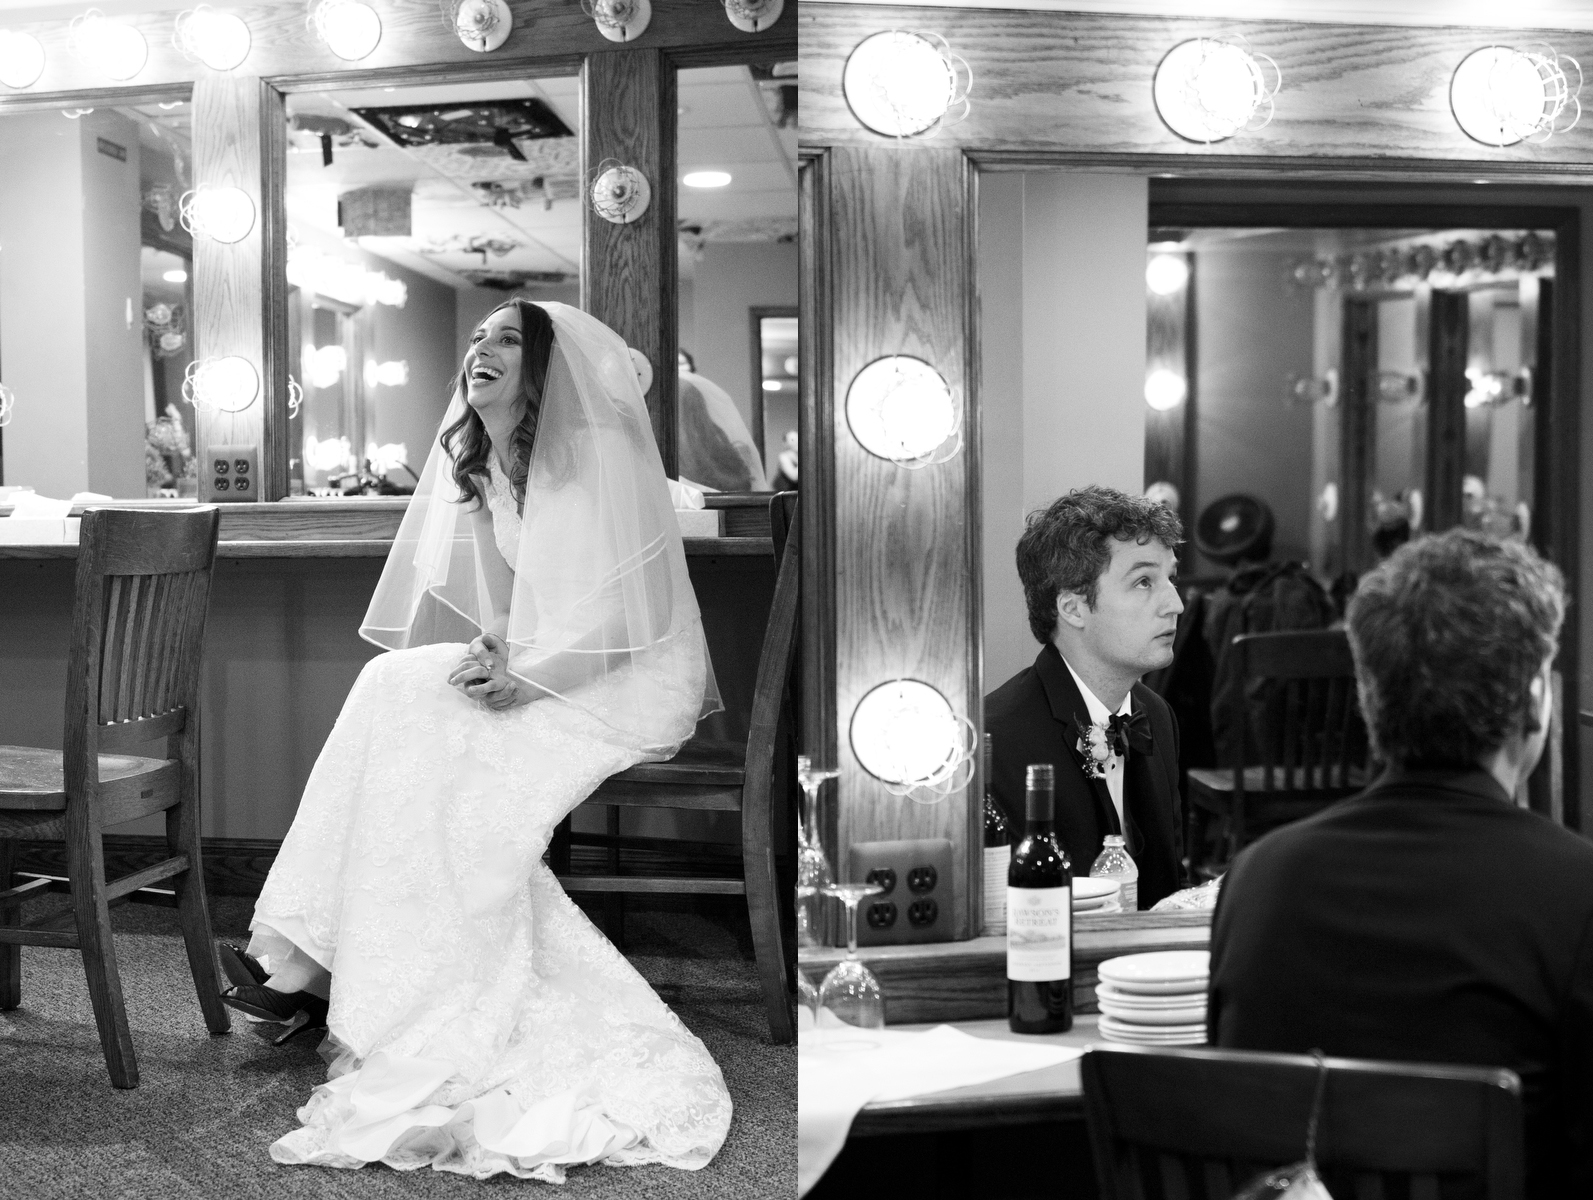 061116 WEDDING Daphna & Keith 180A.JPG